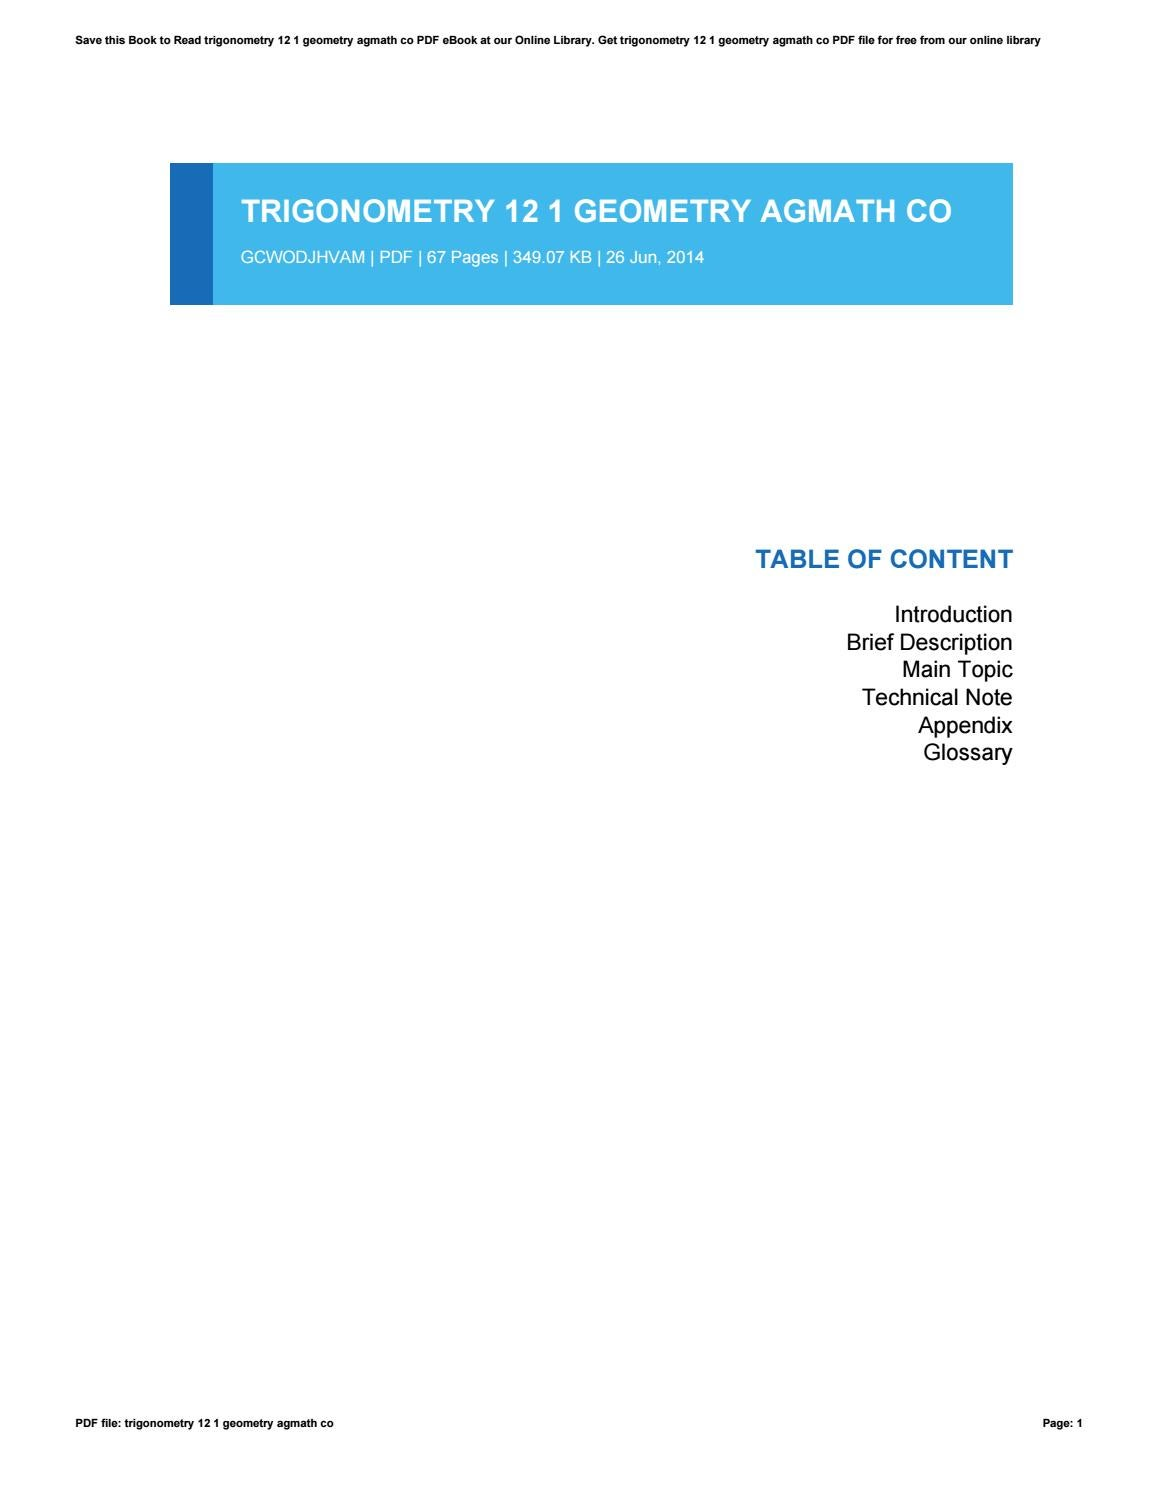 Trigonometry 12 1 geometry agmath co by ChristineStanton3328 - issuu